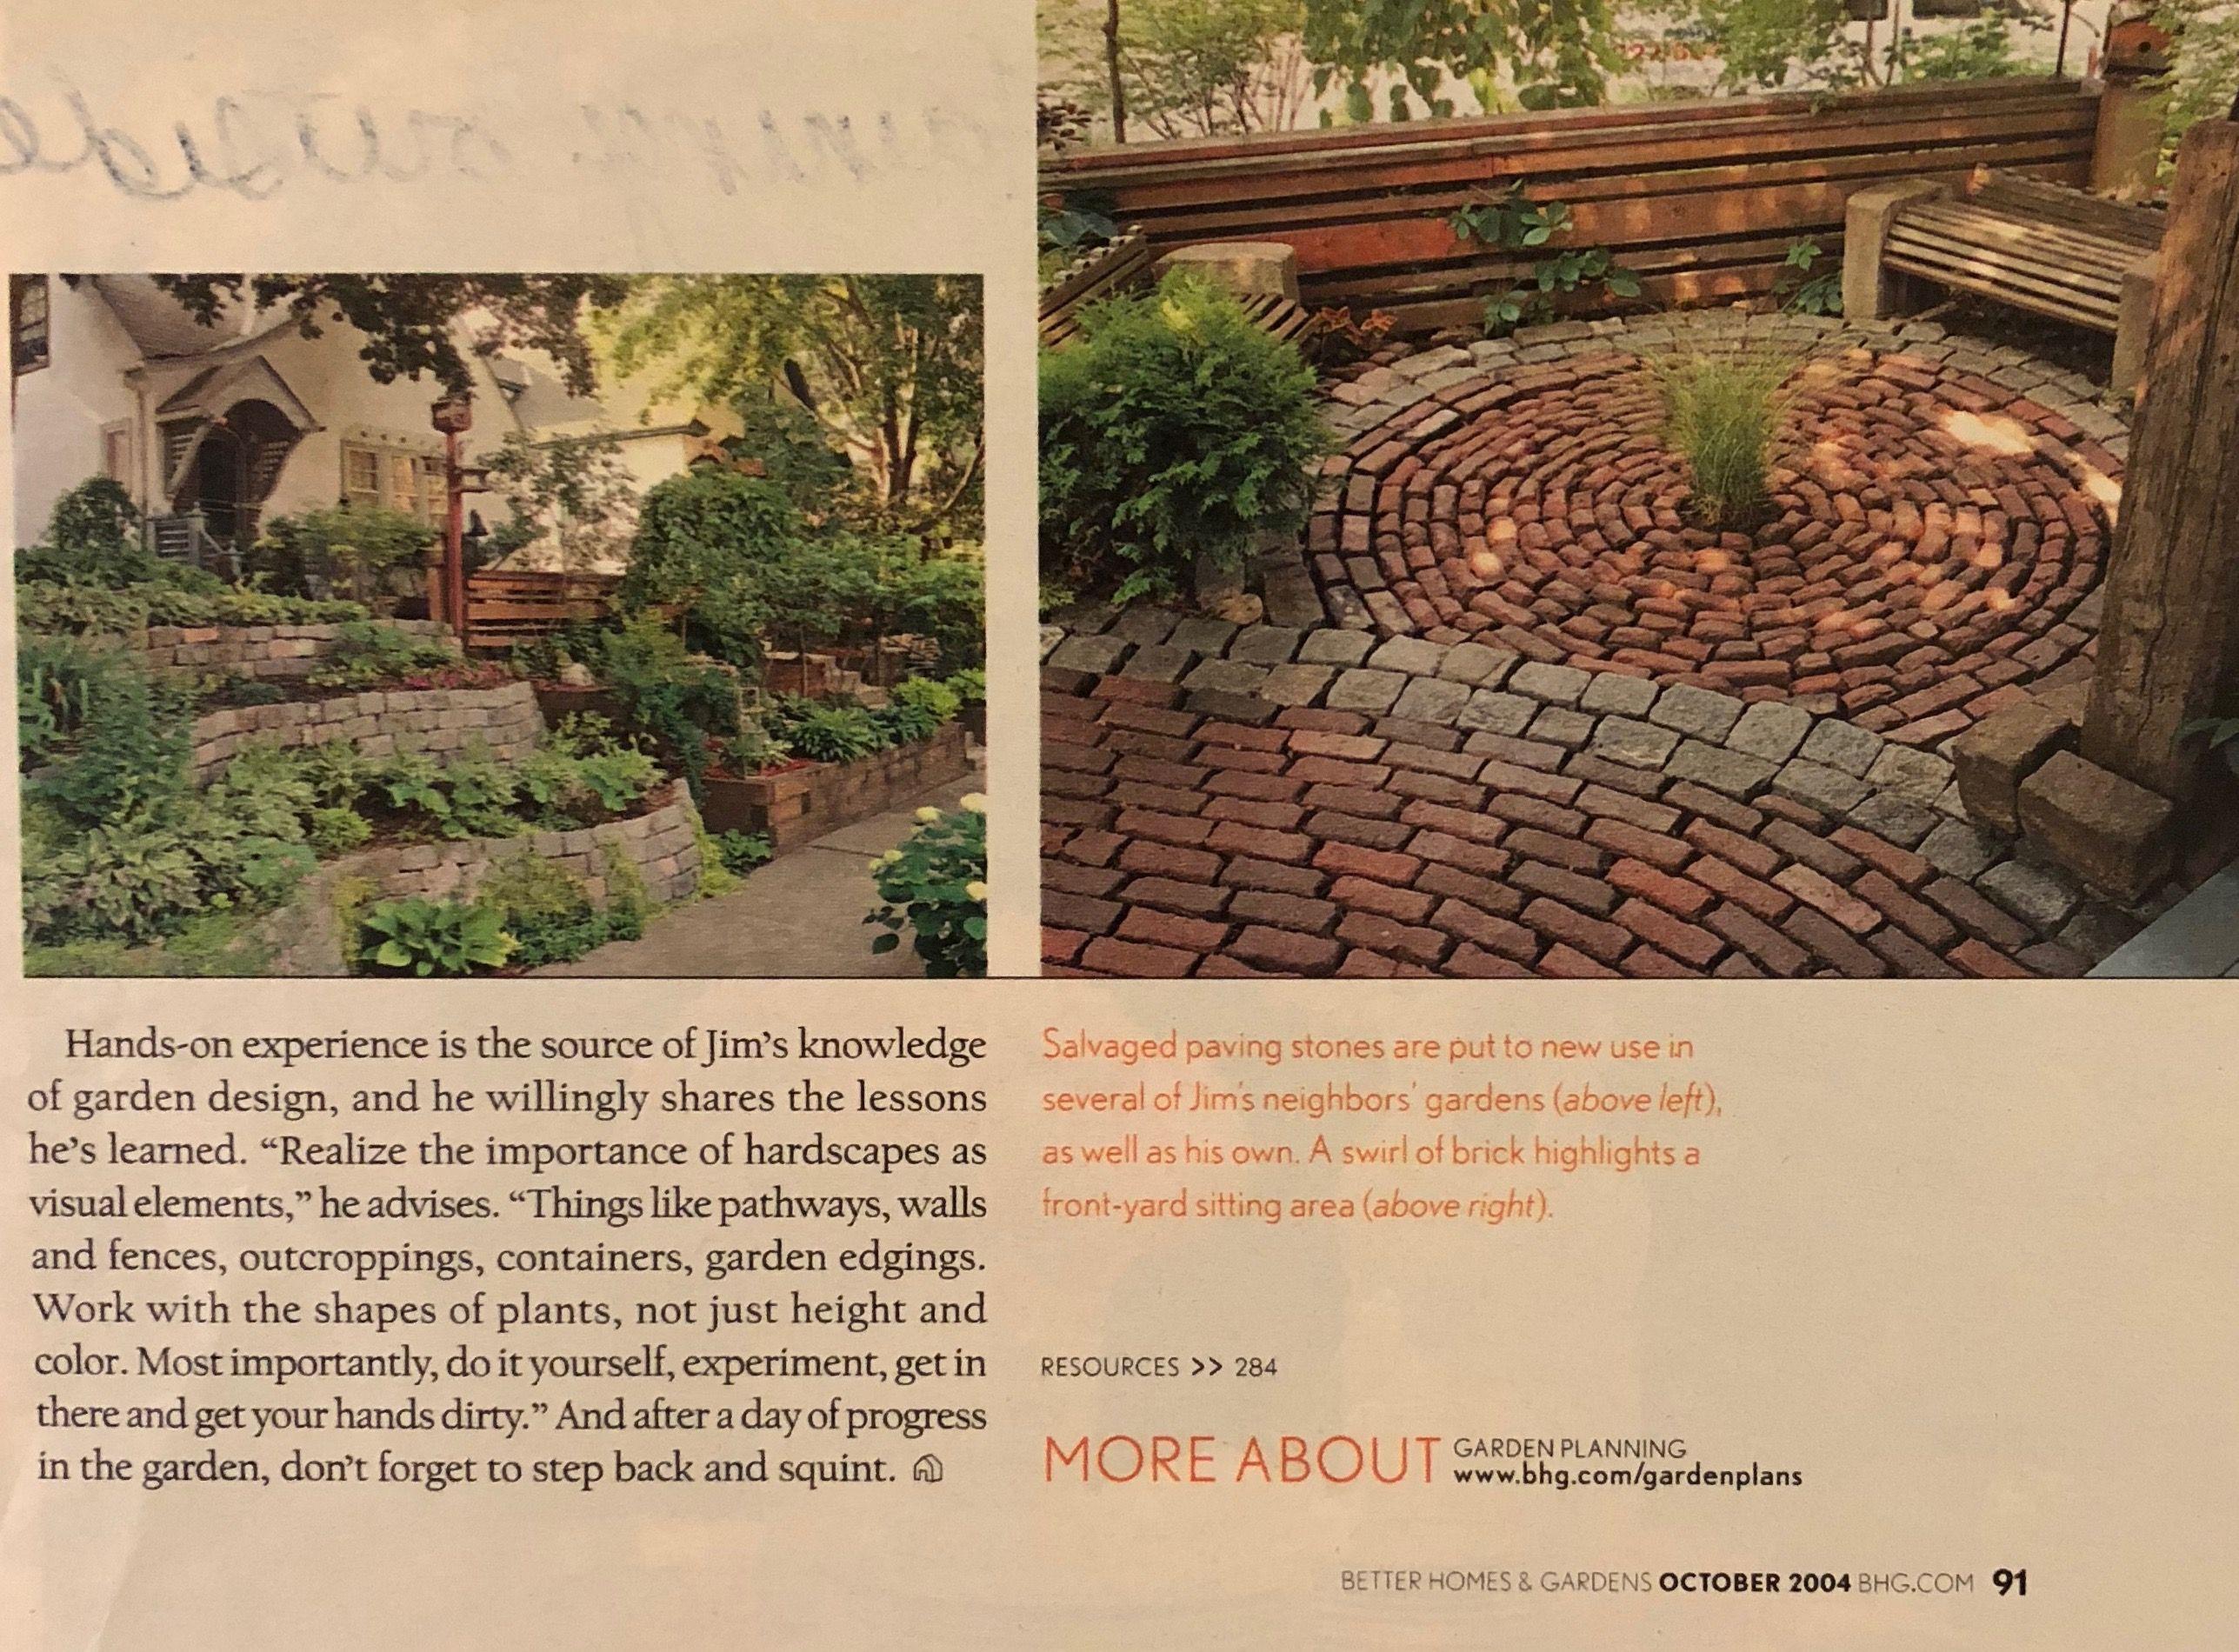 Pin by Brook Andrews on Landscape/garden   Pinterest   Gardens